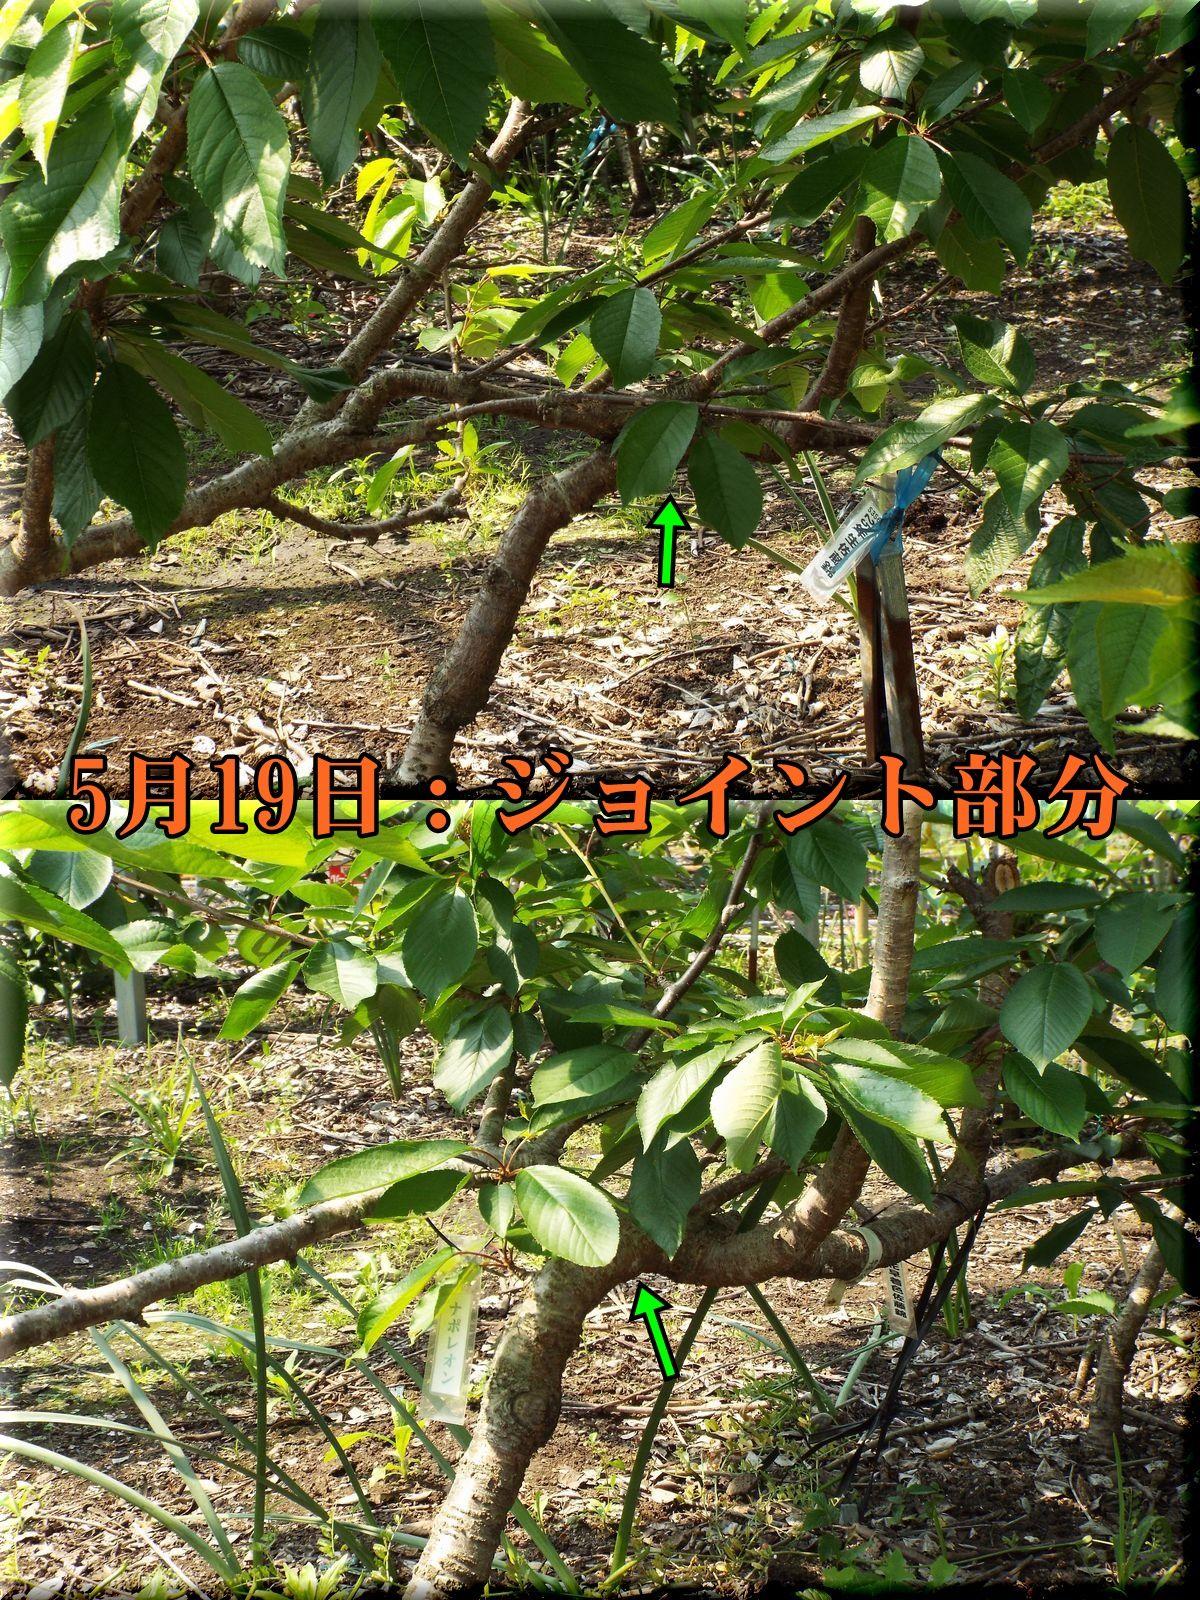 1_H2_joint160519_022.jpg